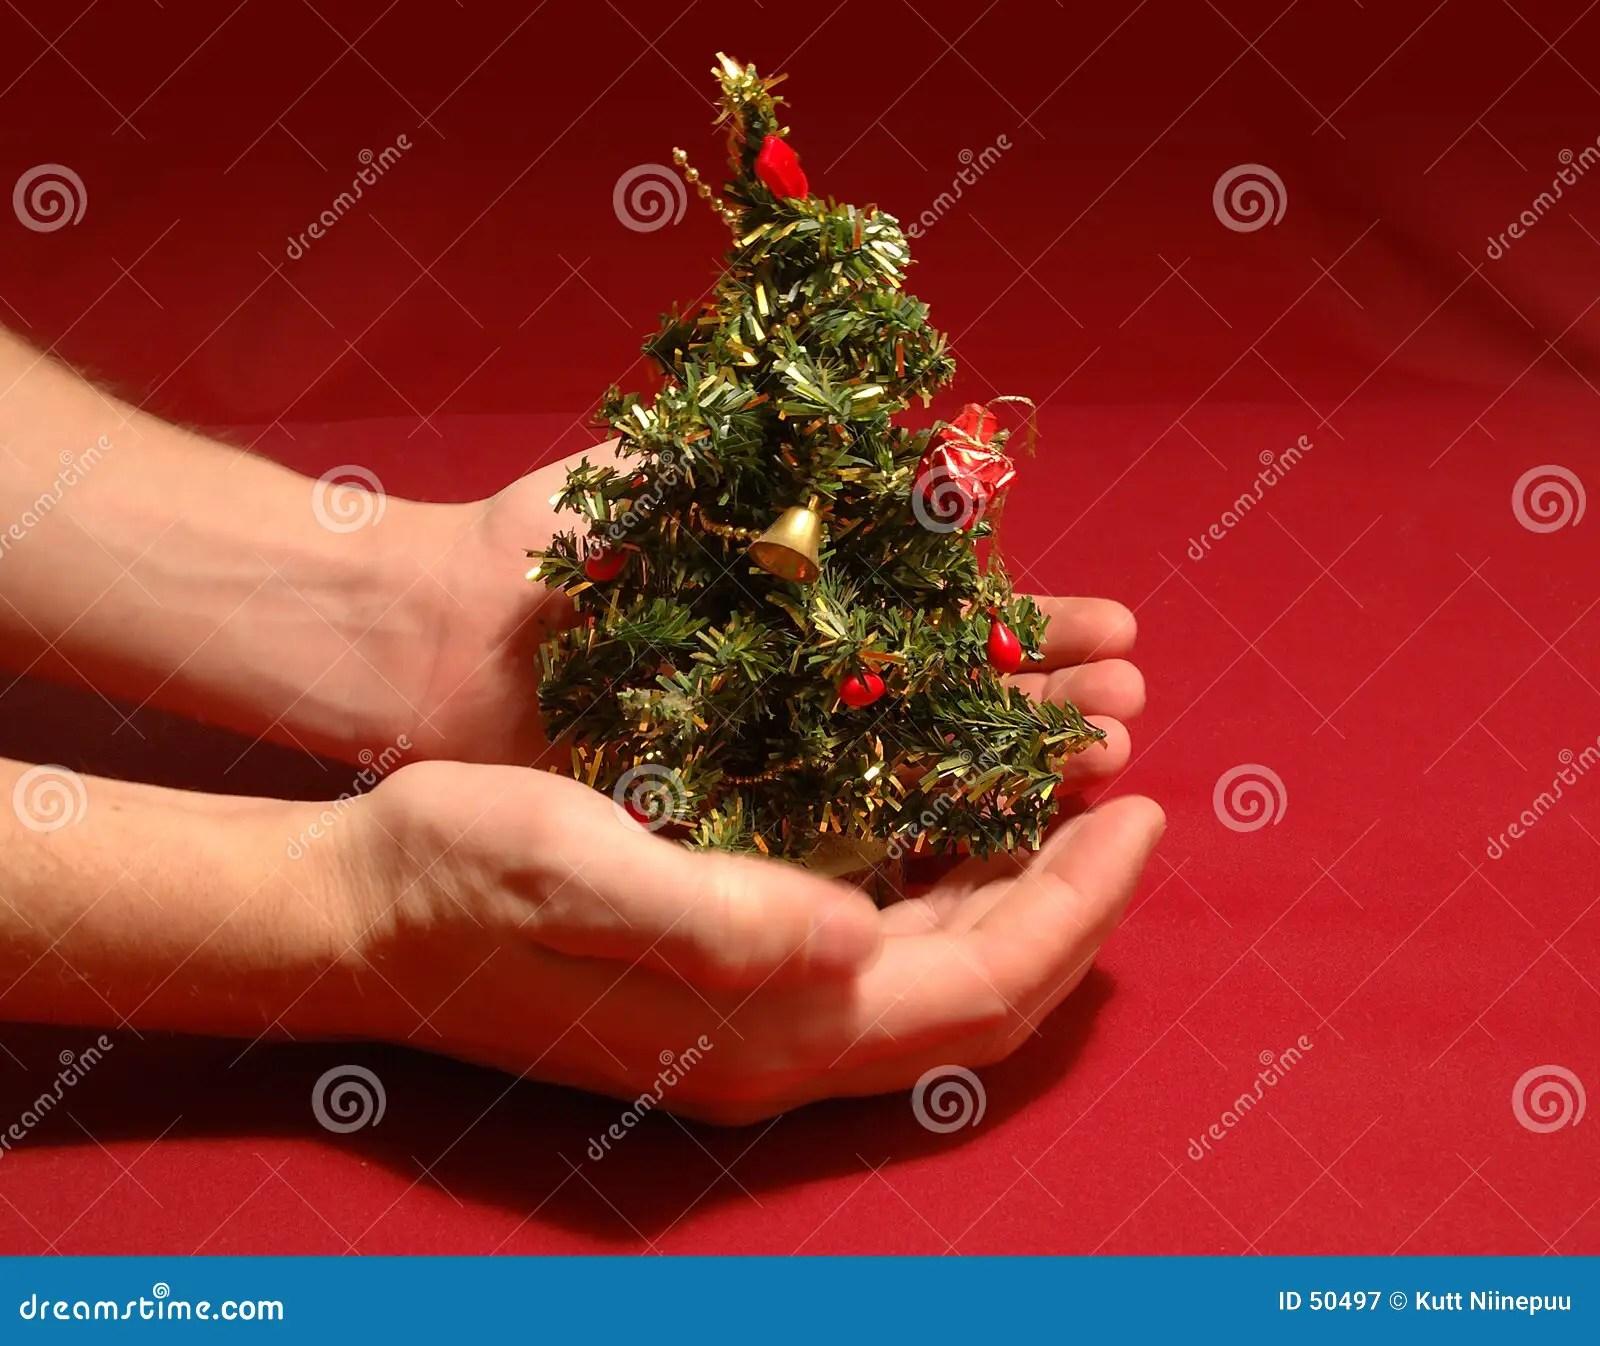 Happy Christmas Wallpaper 3d Tiny Christmas Tree Royalty Free Stock Photography Image